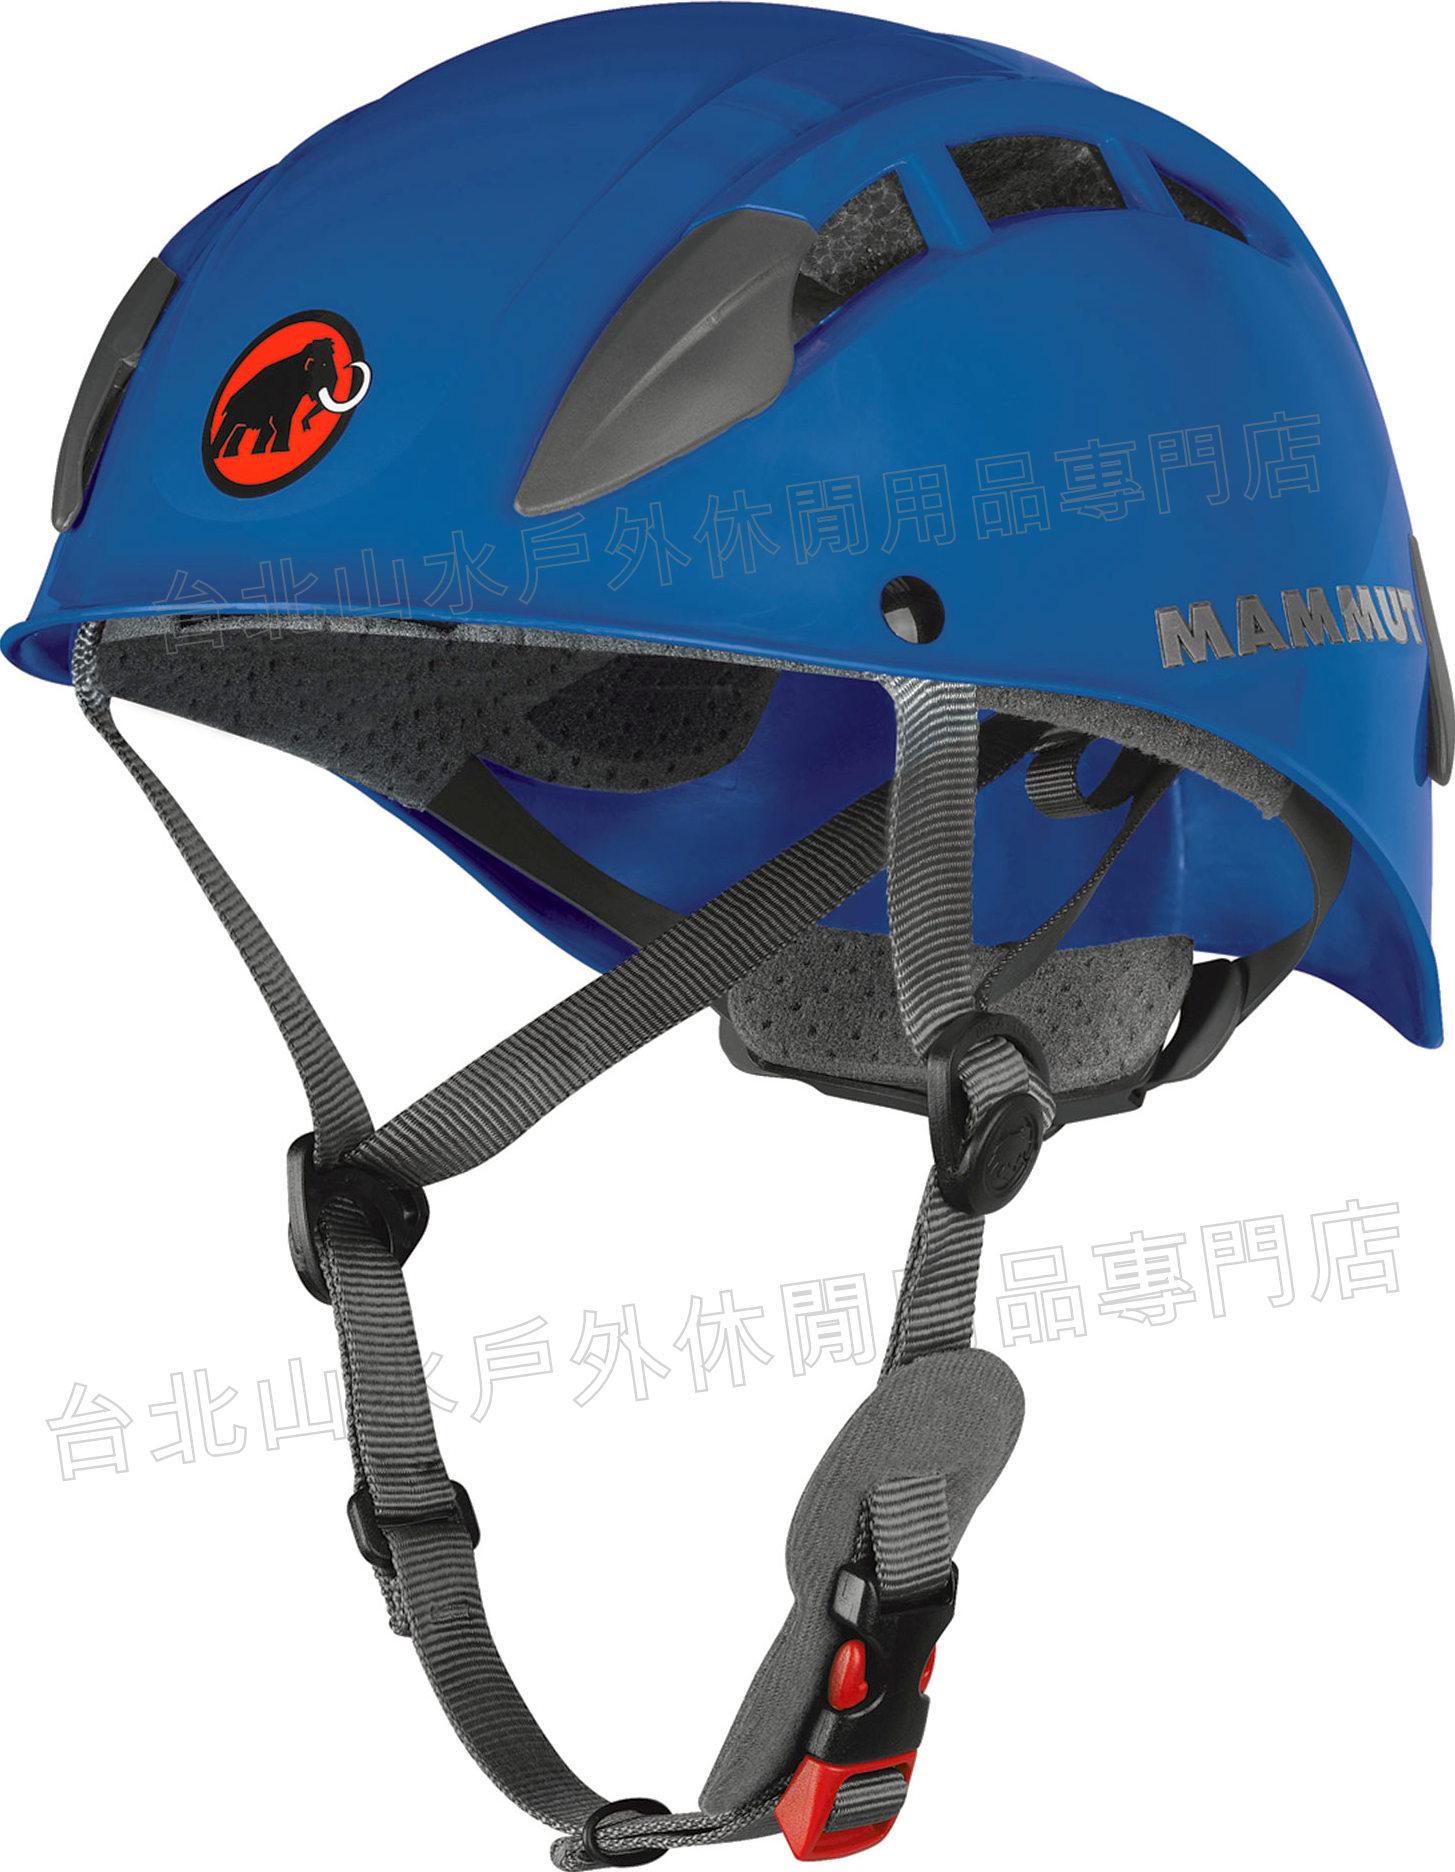 Mammut 長毛象 Skywalker 2 Helmet 瑞士長毛象 頭盔/岩盔 2220-00050 藍色